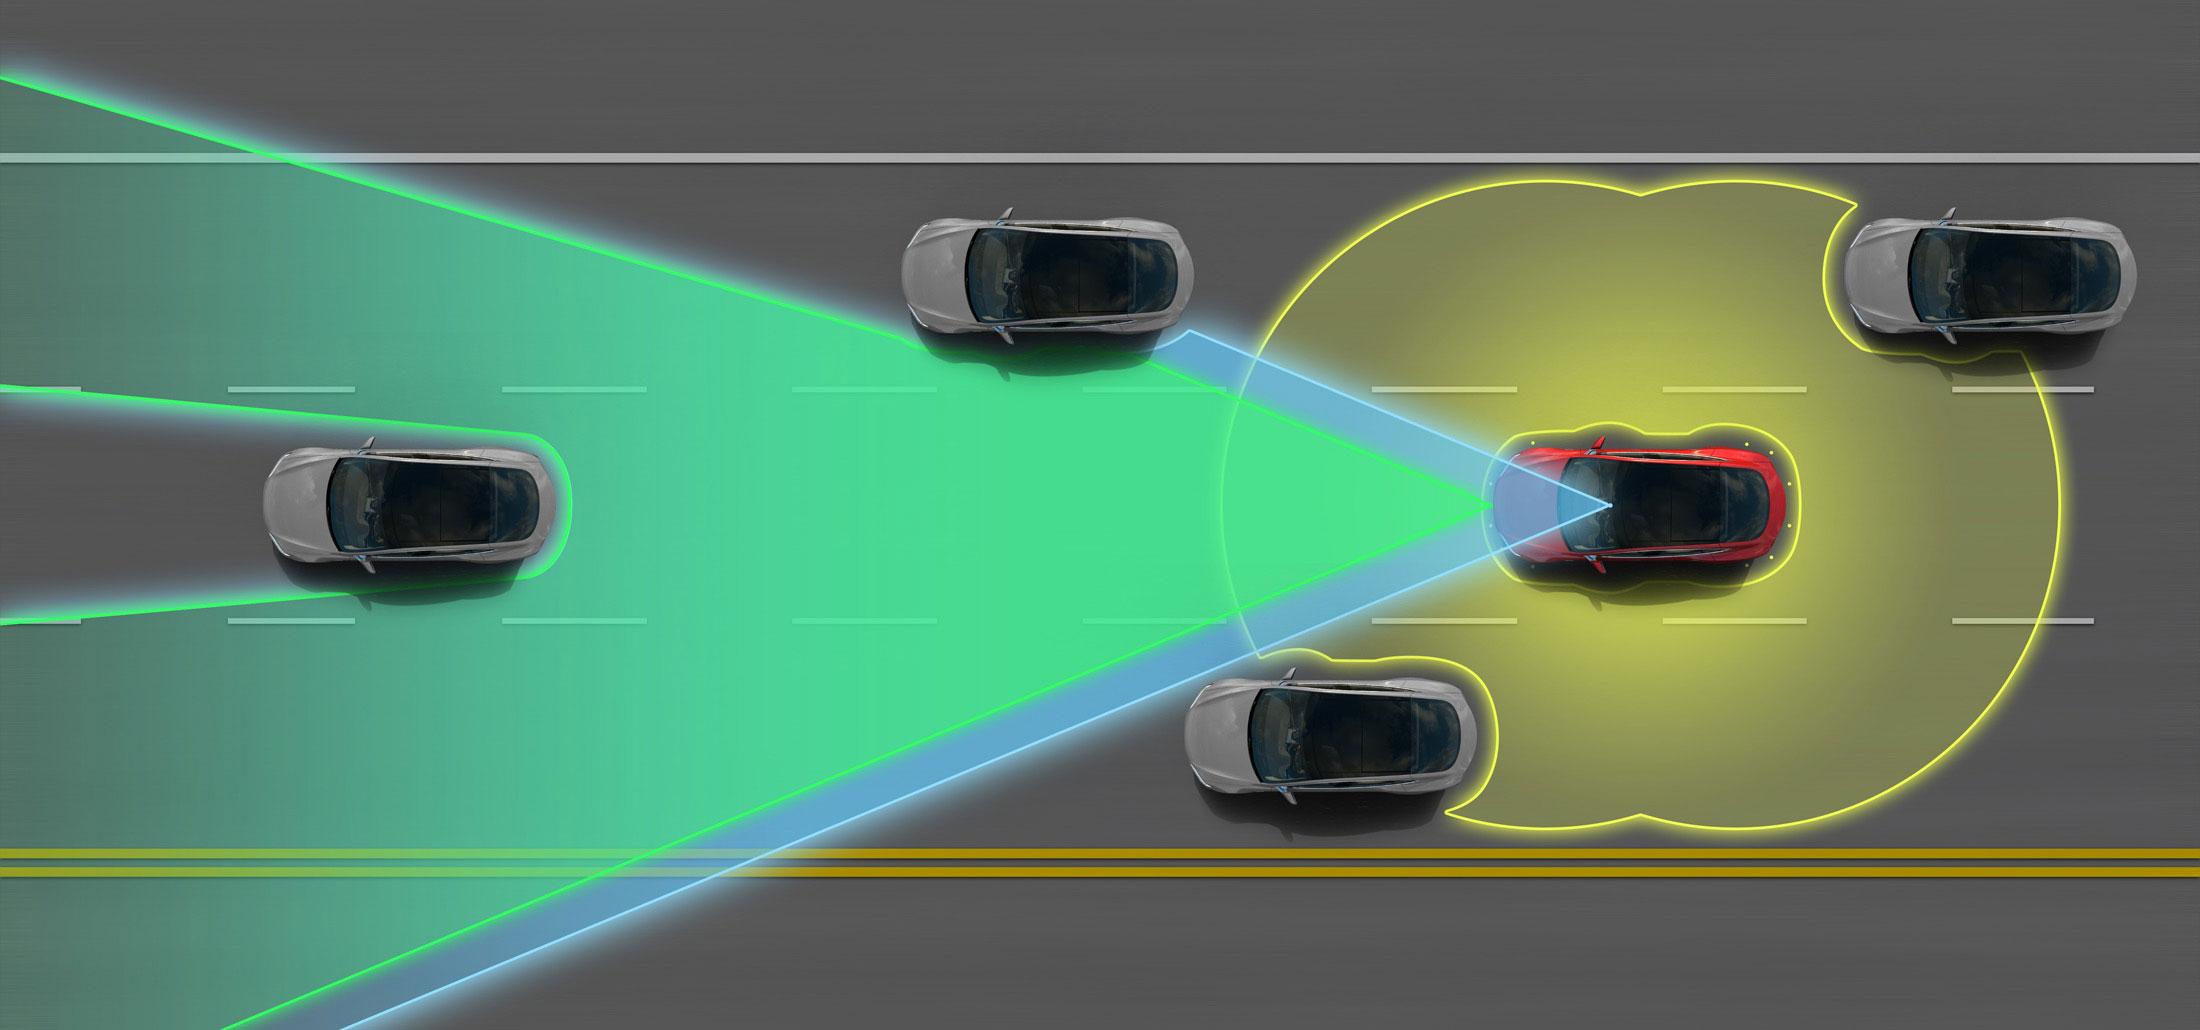 tesla-model-s-autopilot-sensors.jpg